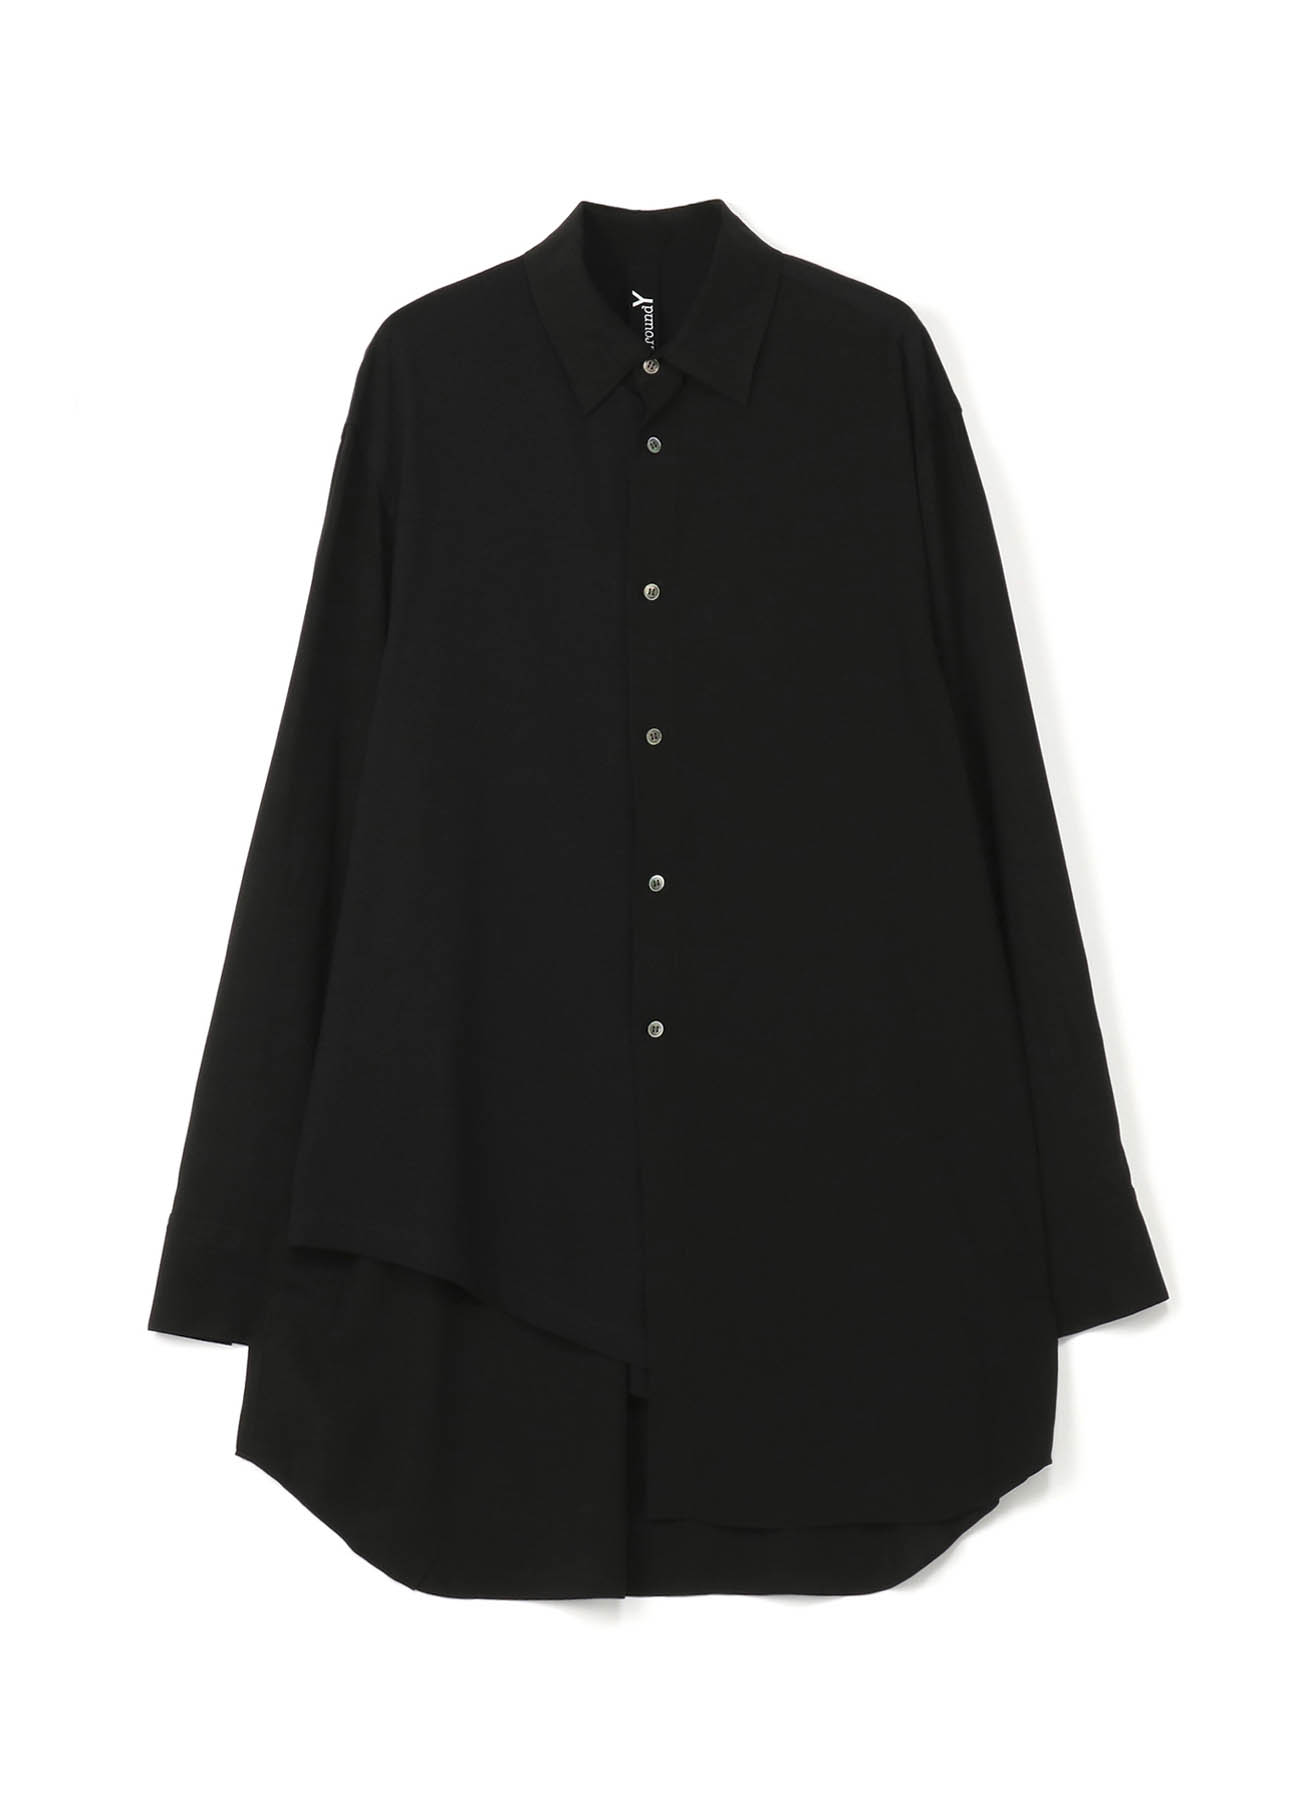 Ry/斜纹&30 /天竺棉不对称衬衫